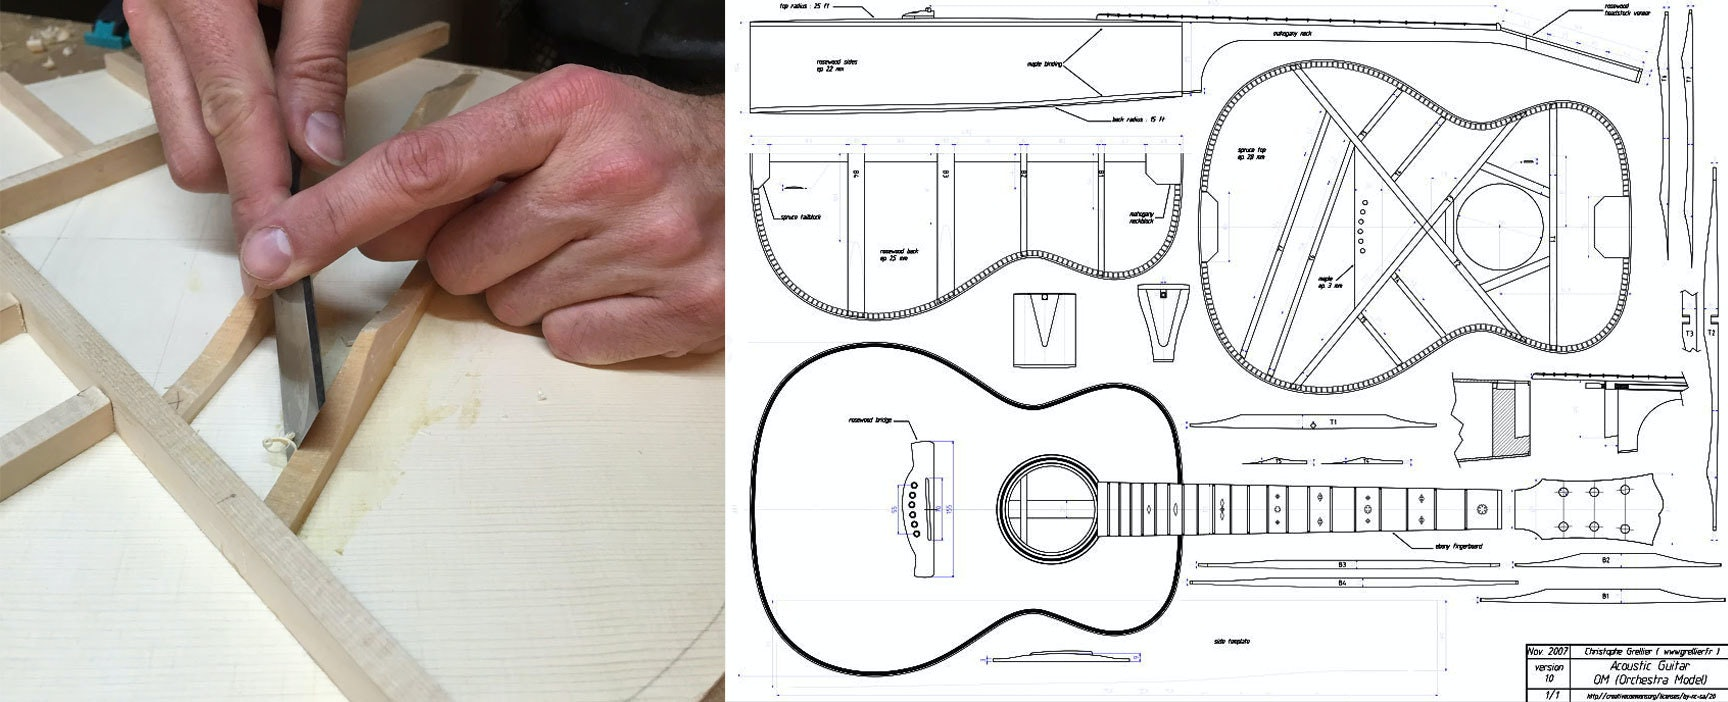 Leif Guitar Plan